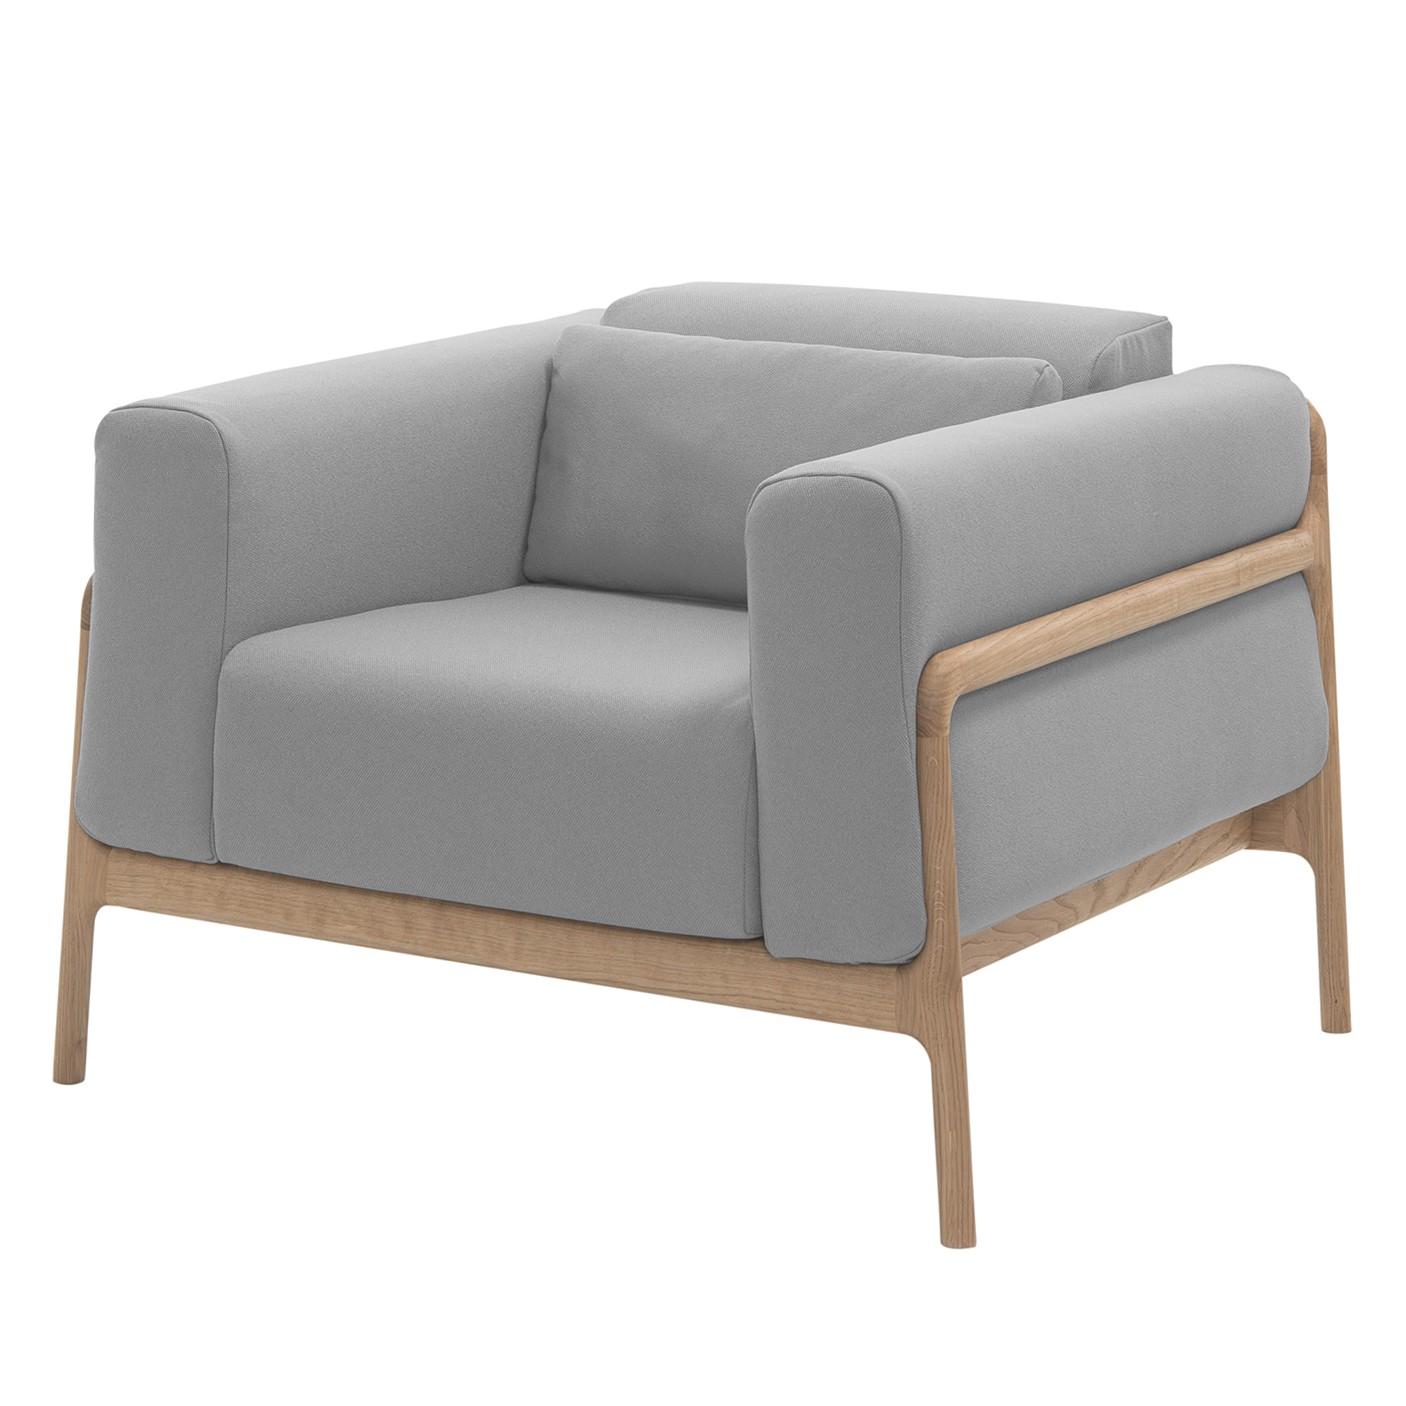 Designer Möbel Trends Gazzda Sessel Fawn Webstoff Fawn Online